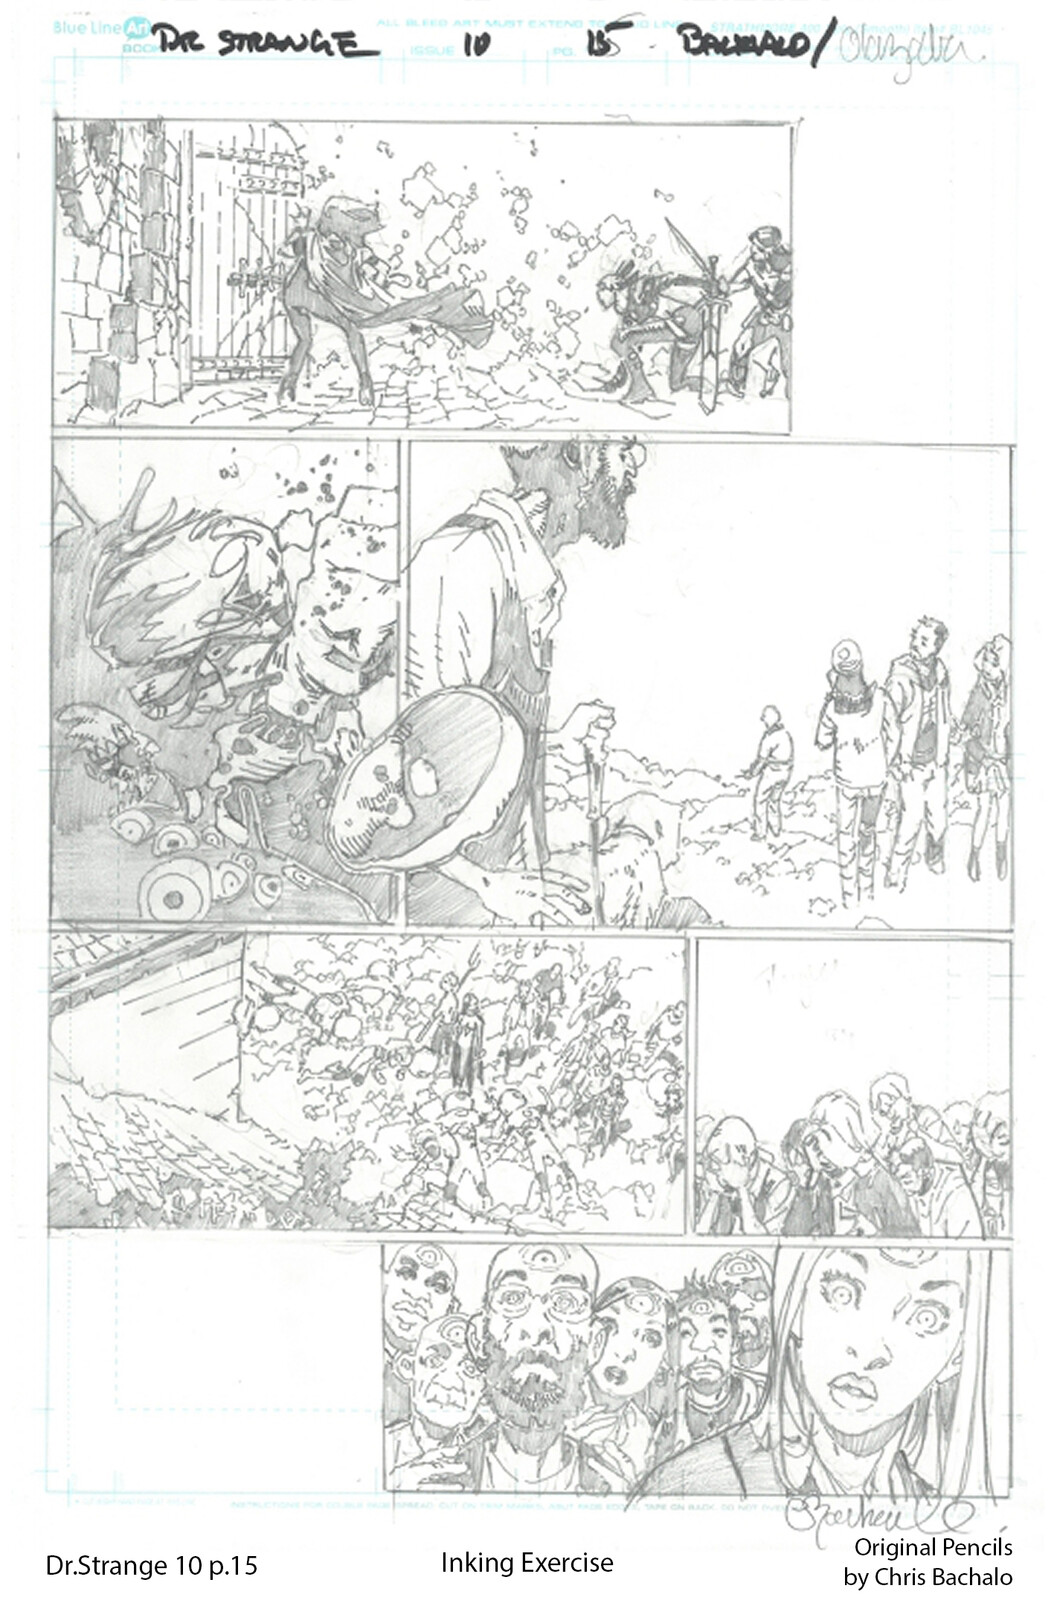 Dr.Strange #10 - page 15 Original pencils by Chris Bachalo